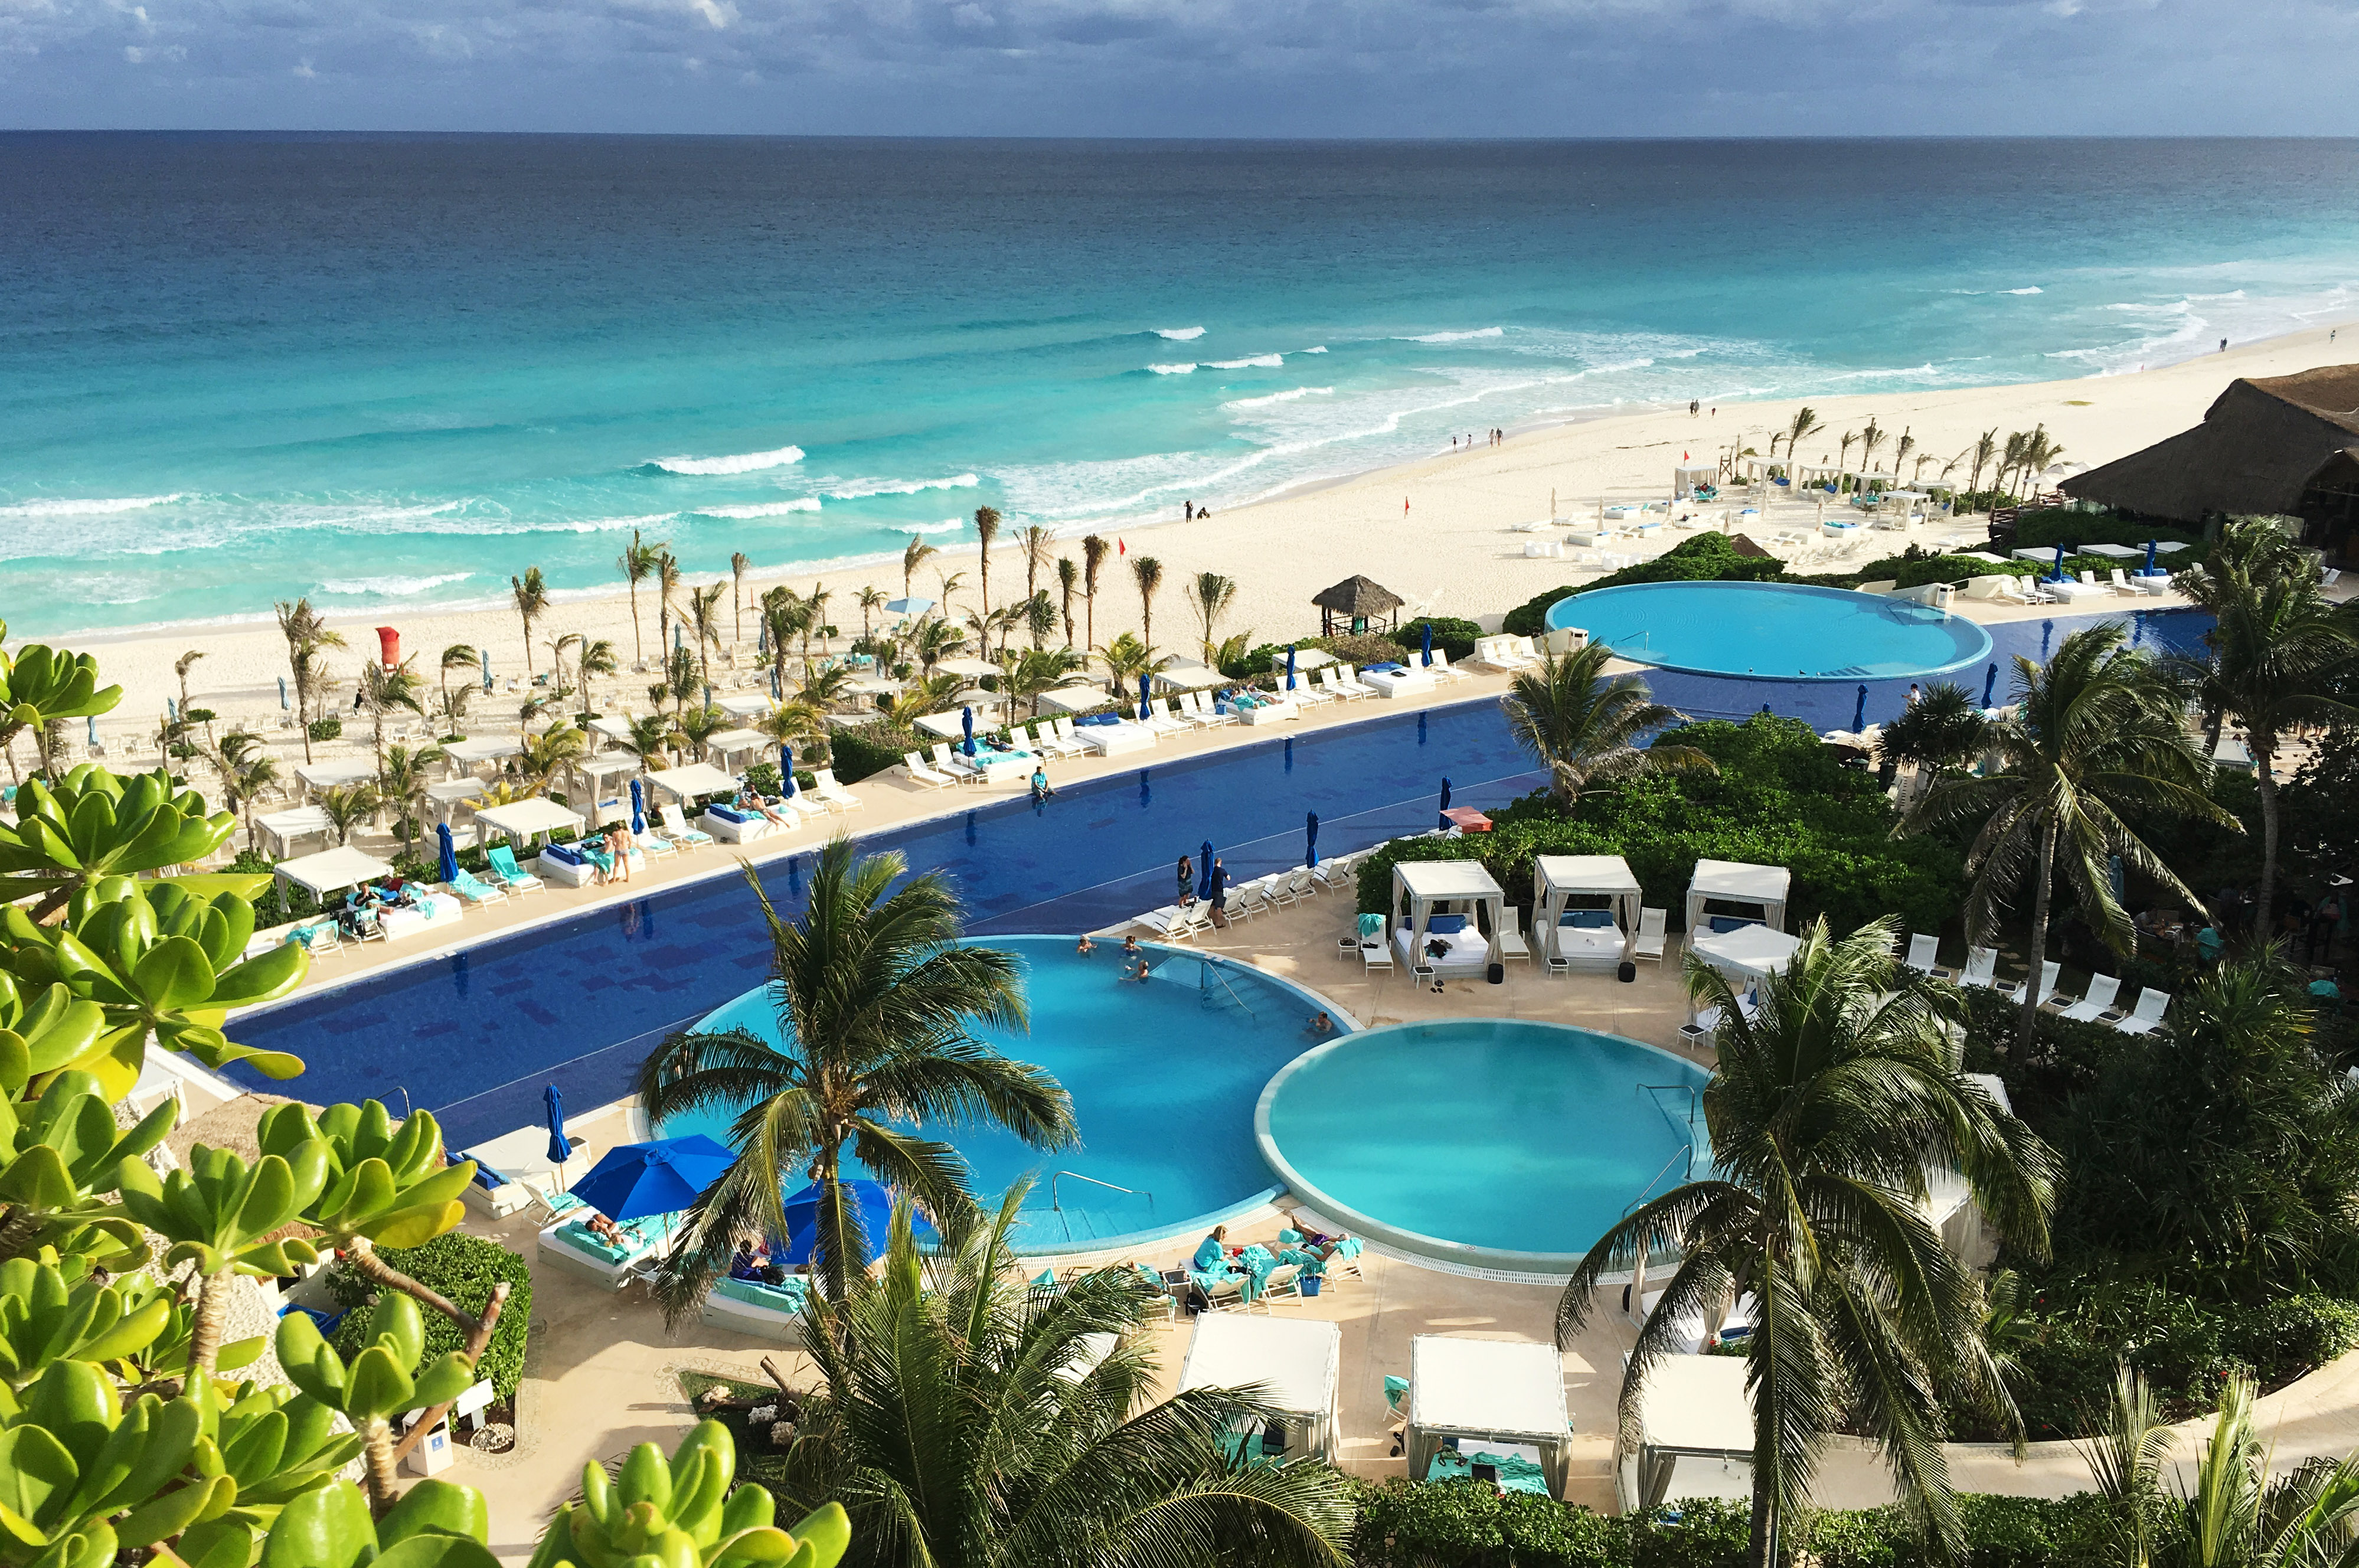 Breaking Travel News investigates: Live Aqua Beach Resort, Cancún